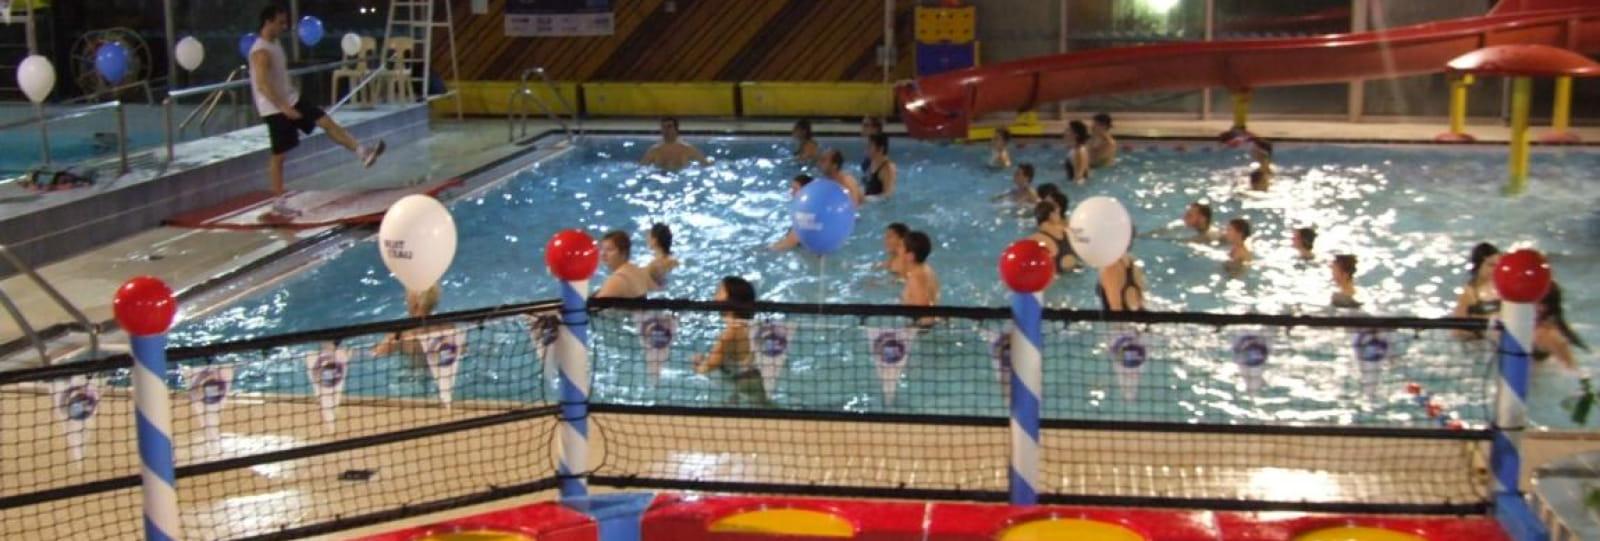 piscine couverte avec toboggans